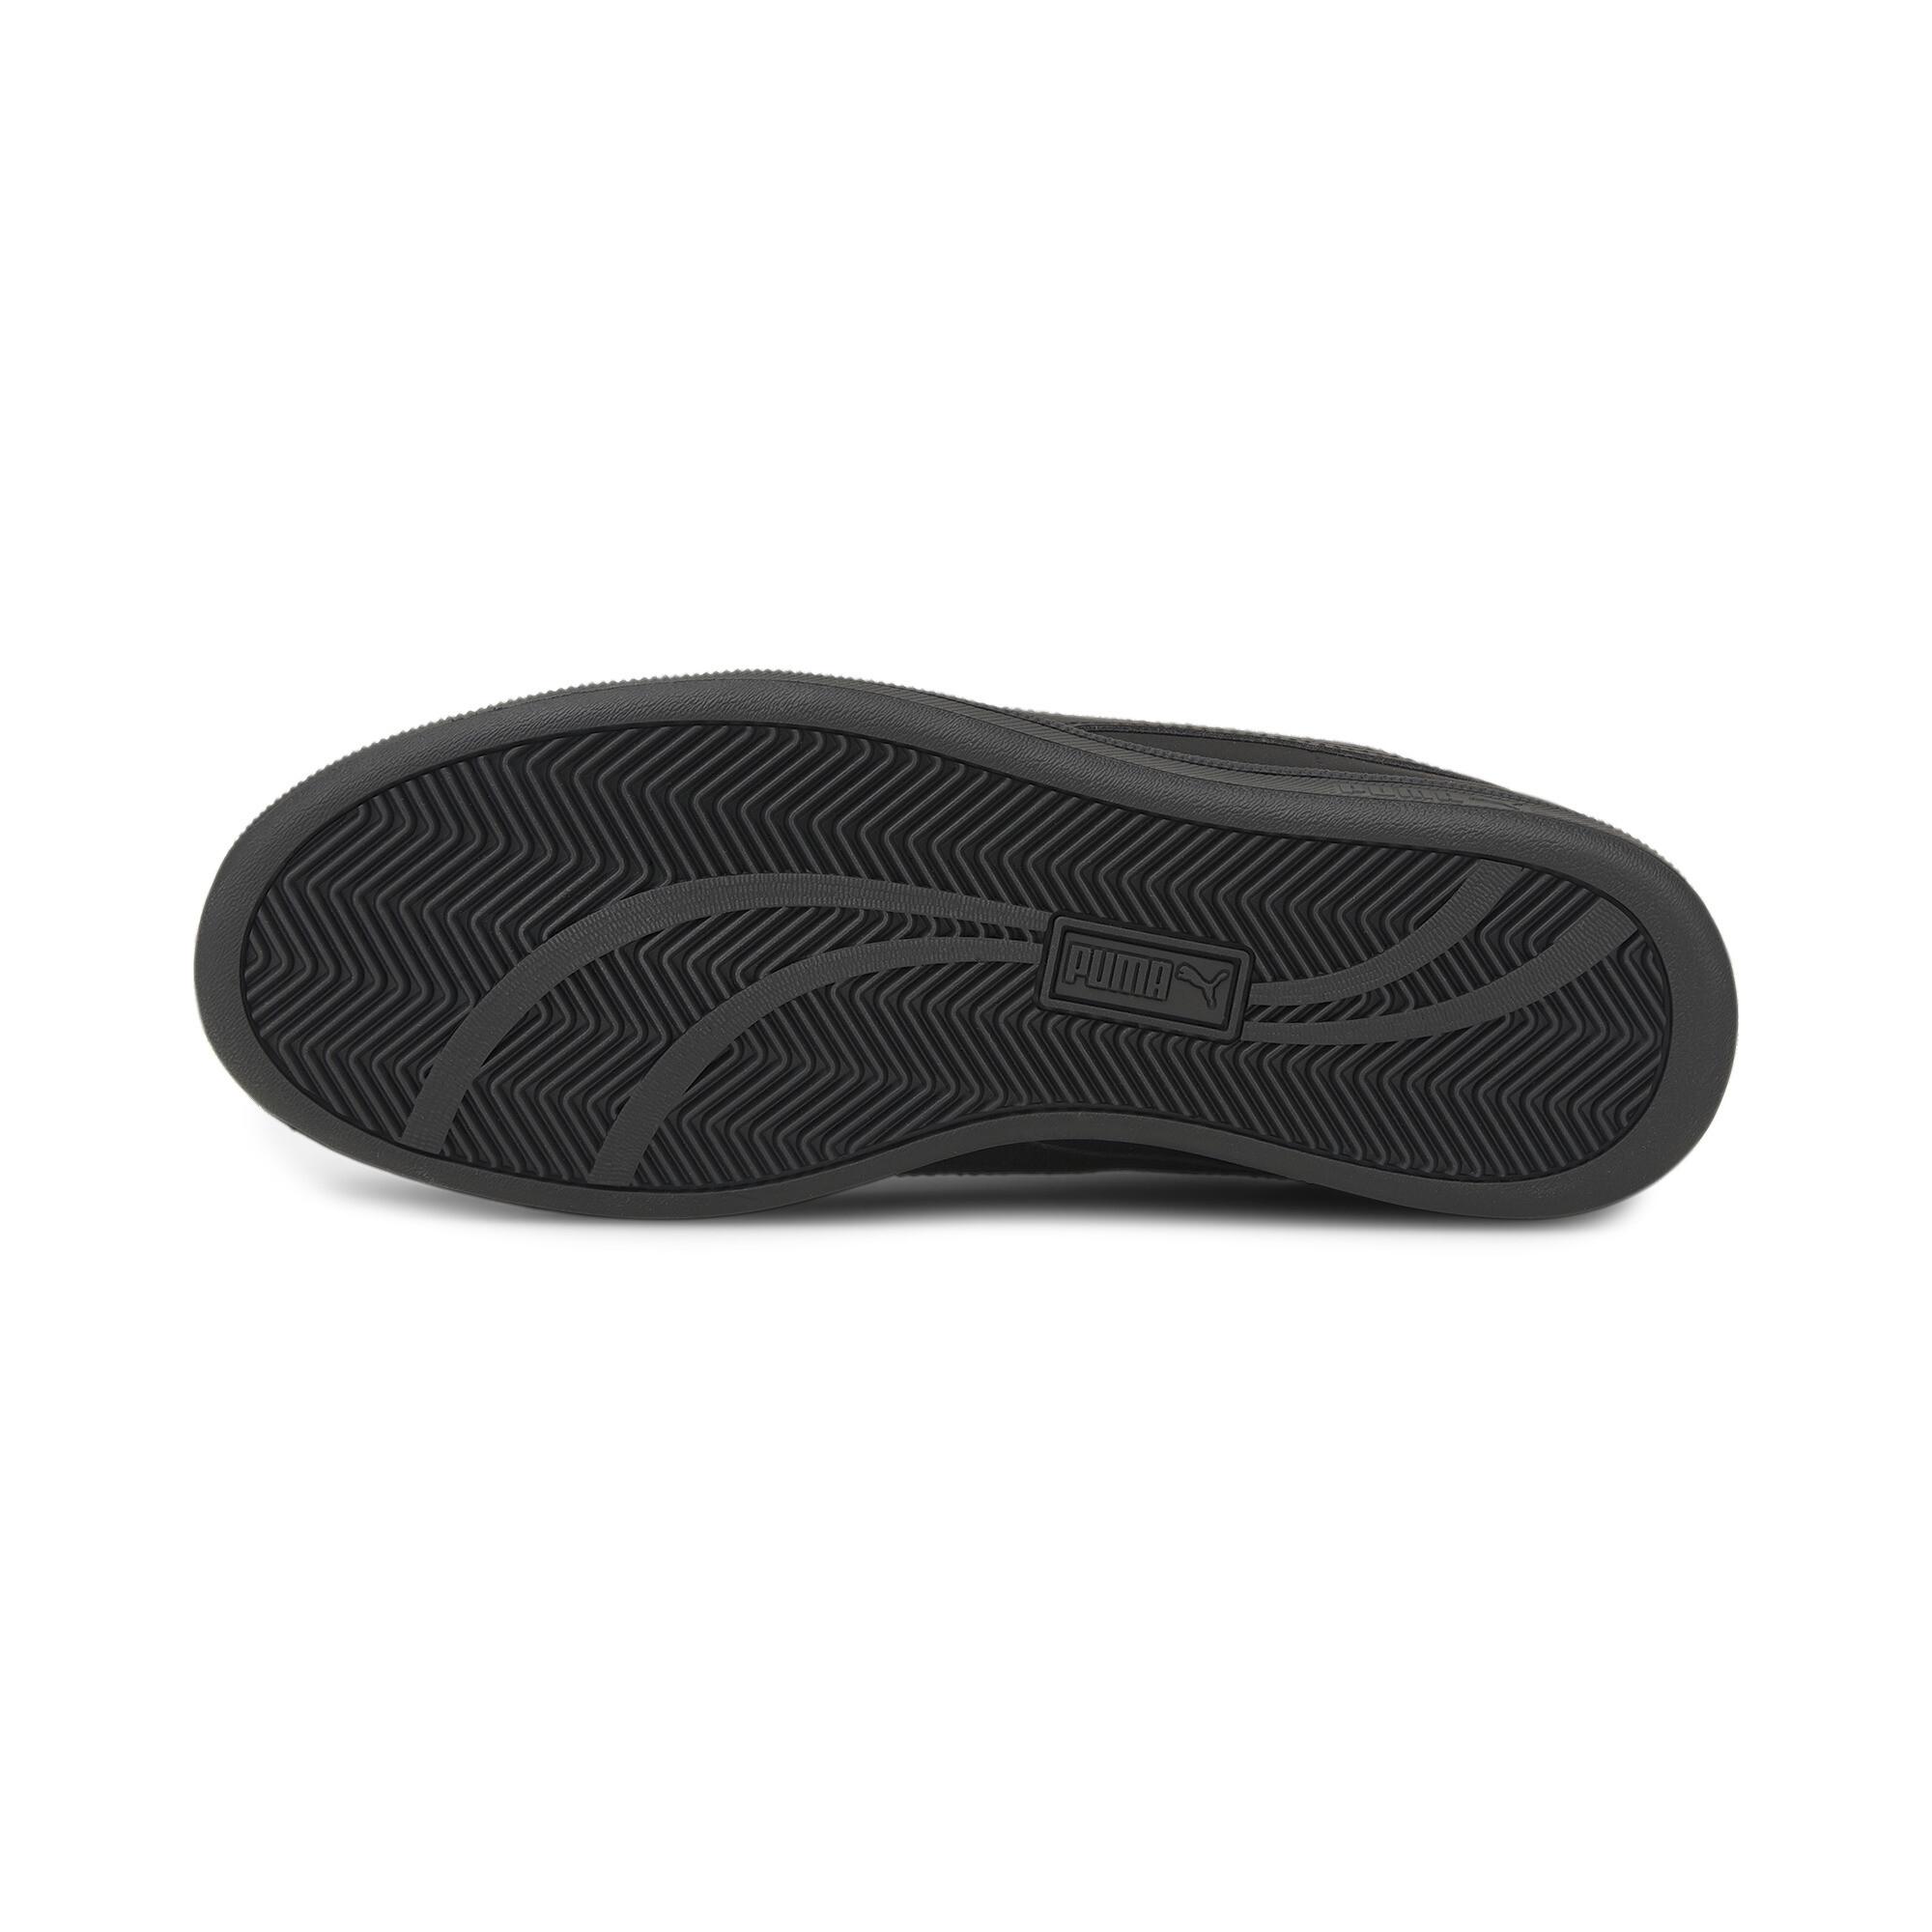 Indexbild 16 - PUMA Smash Buck Sneaker Unisex Schuhe Sport Classics Neu